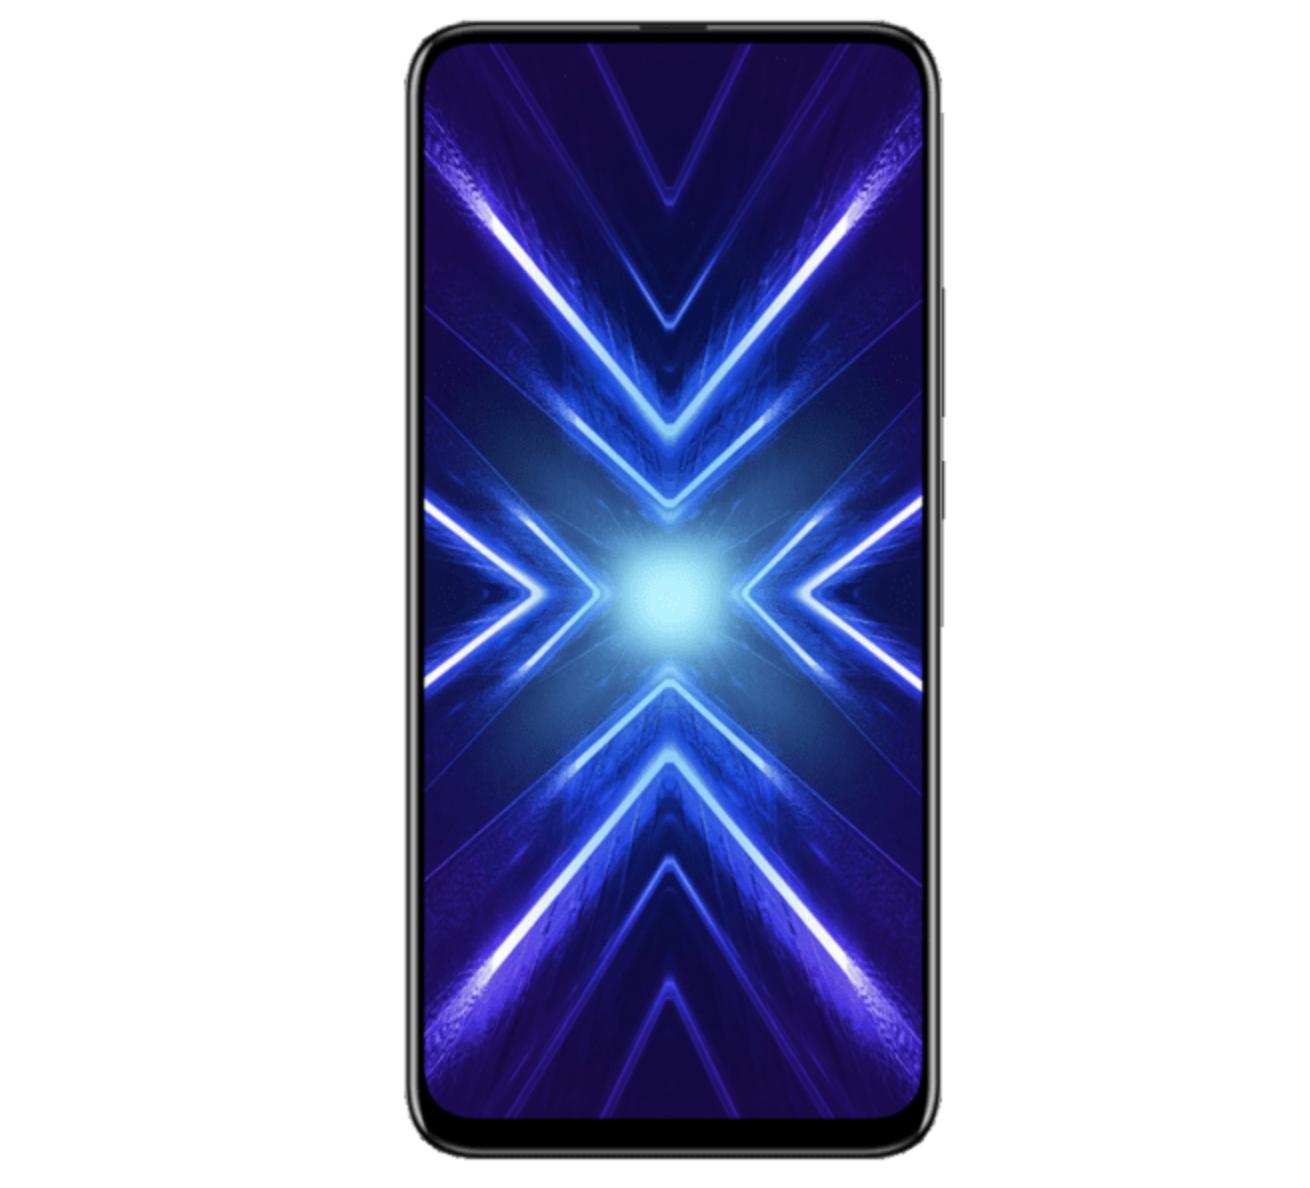 HONOR 9X 128 GB Dual SIM Smartphone für nur 169,- Euro inkl. Versand